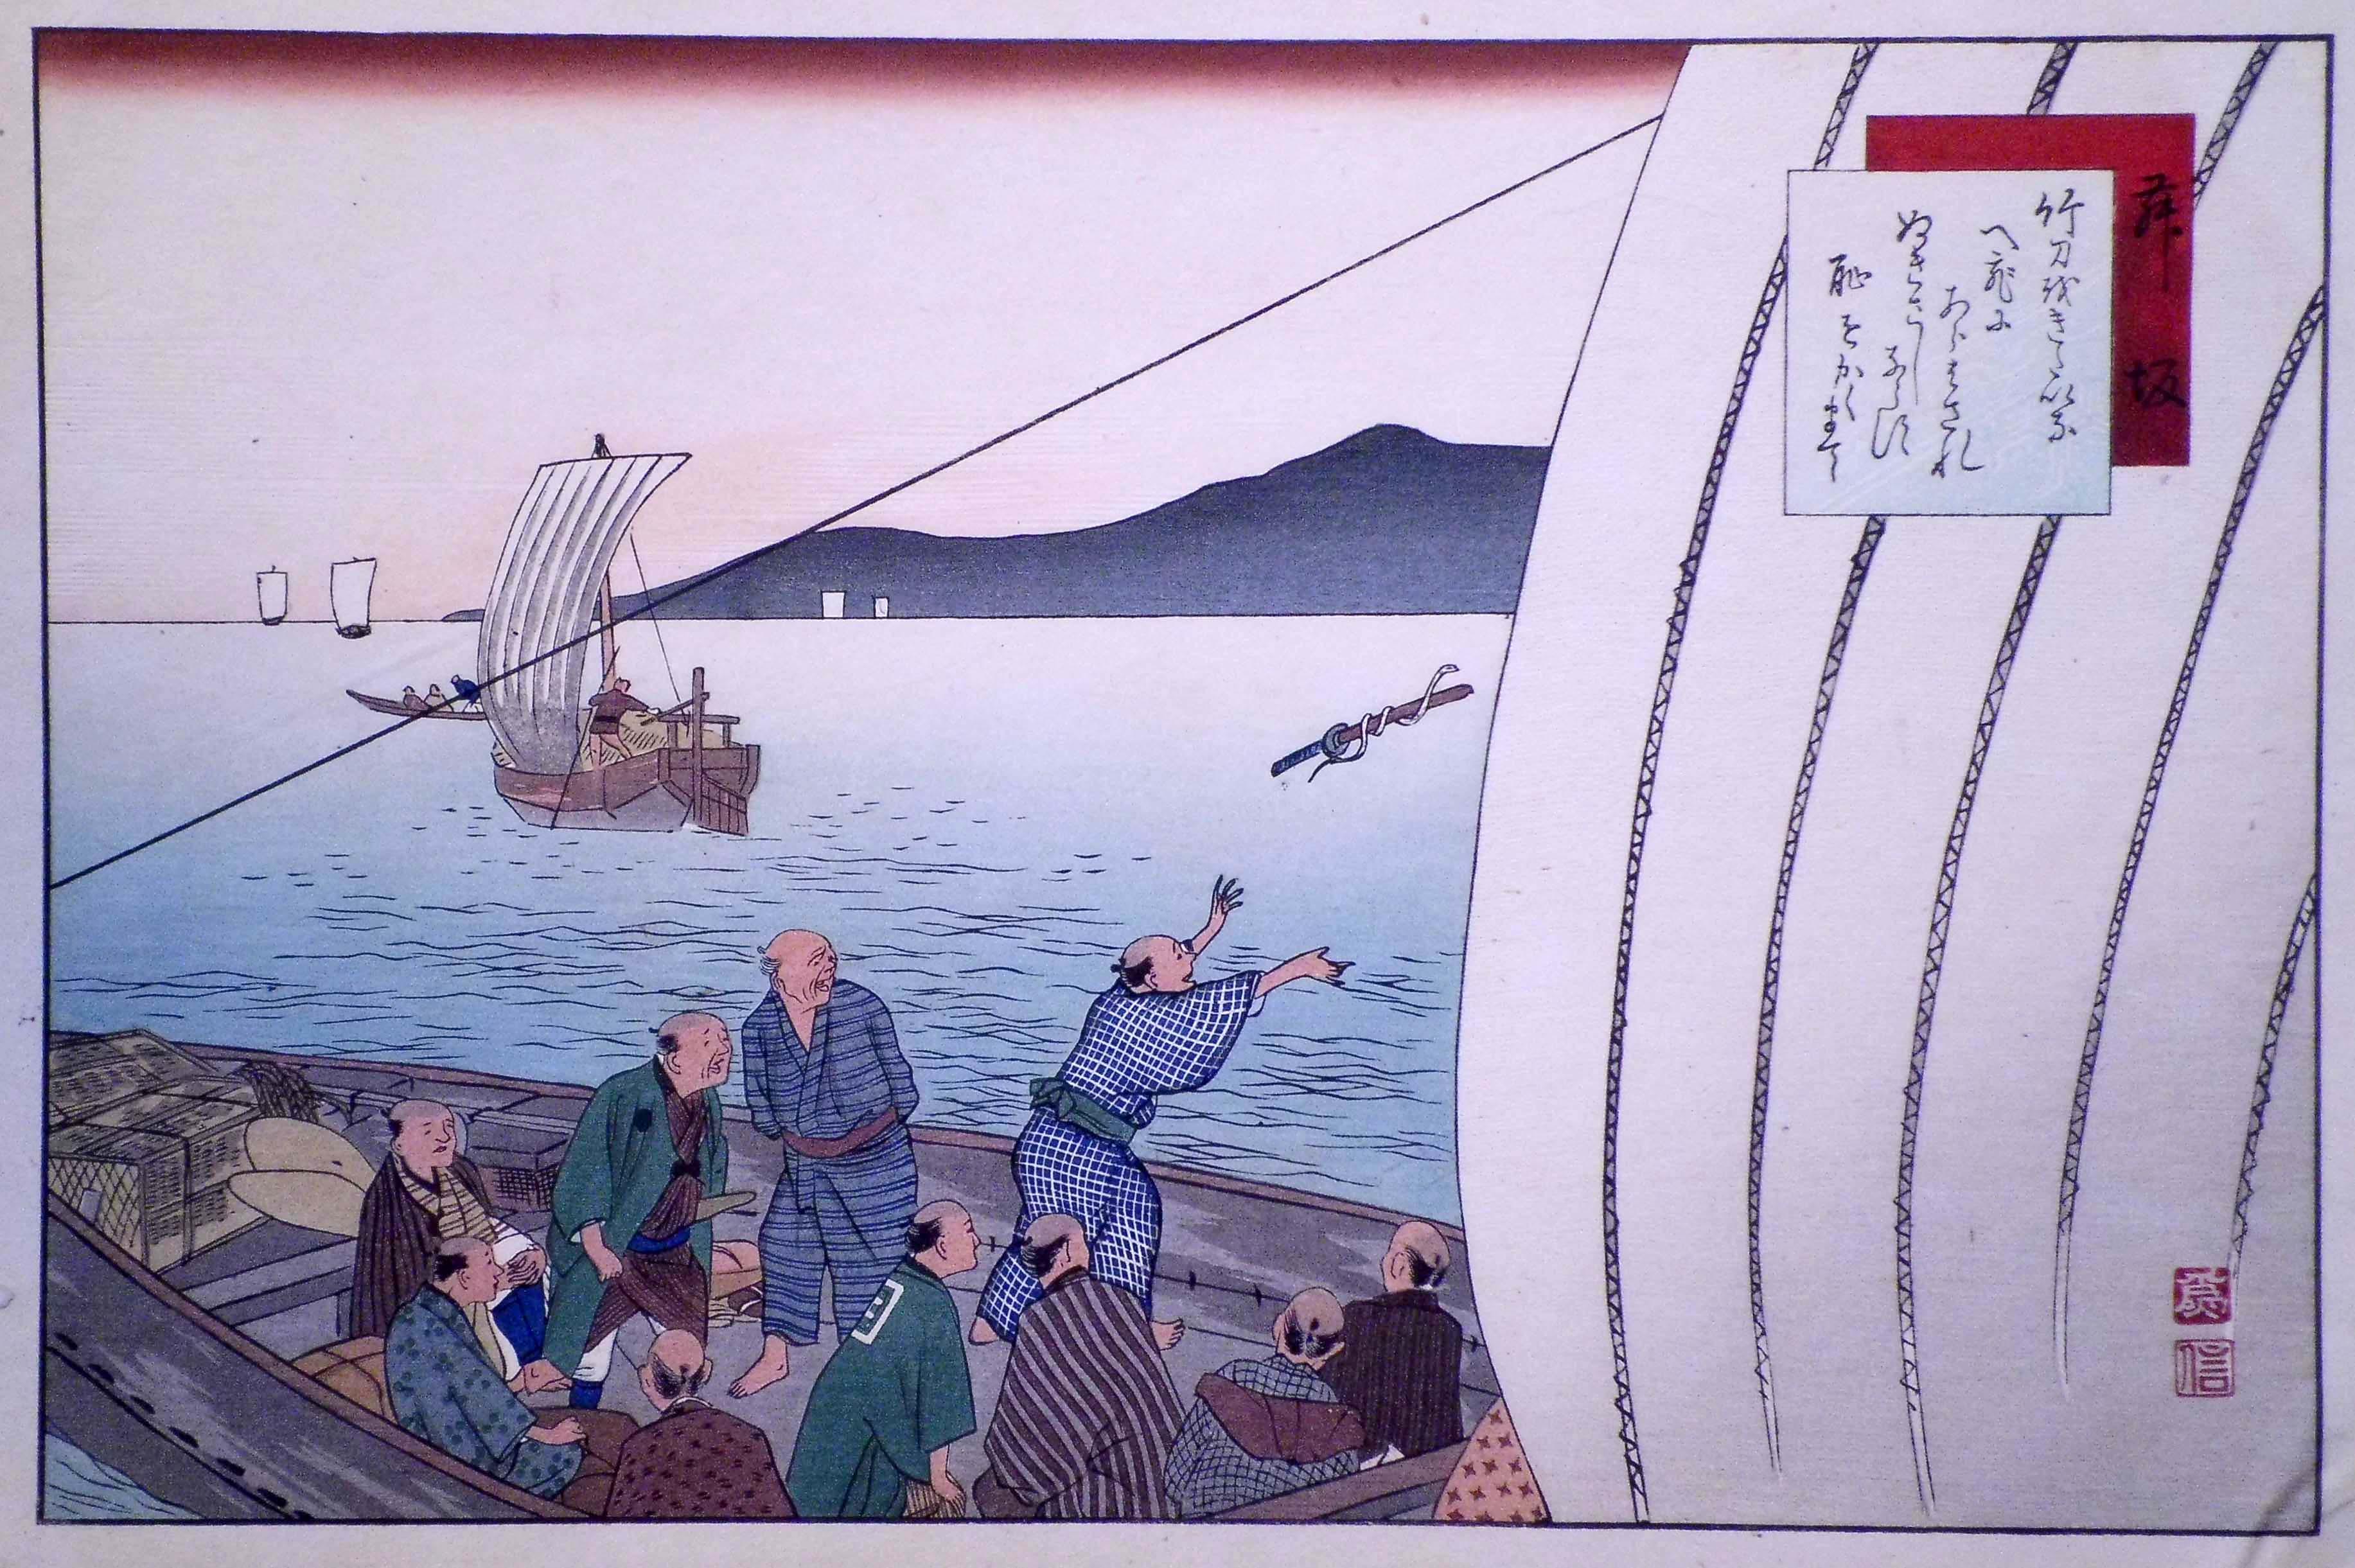 Fujikawa TAMENOBU (attivo nel 1890/1914) – MAISAKA, TRENTESIMA STAZIONE DELLA TOKAIDO